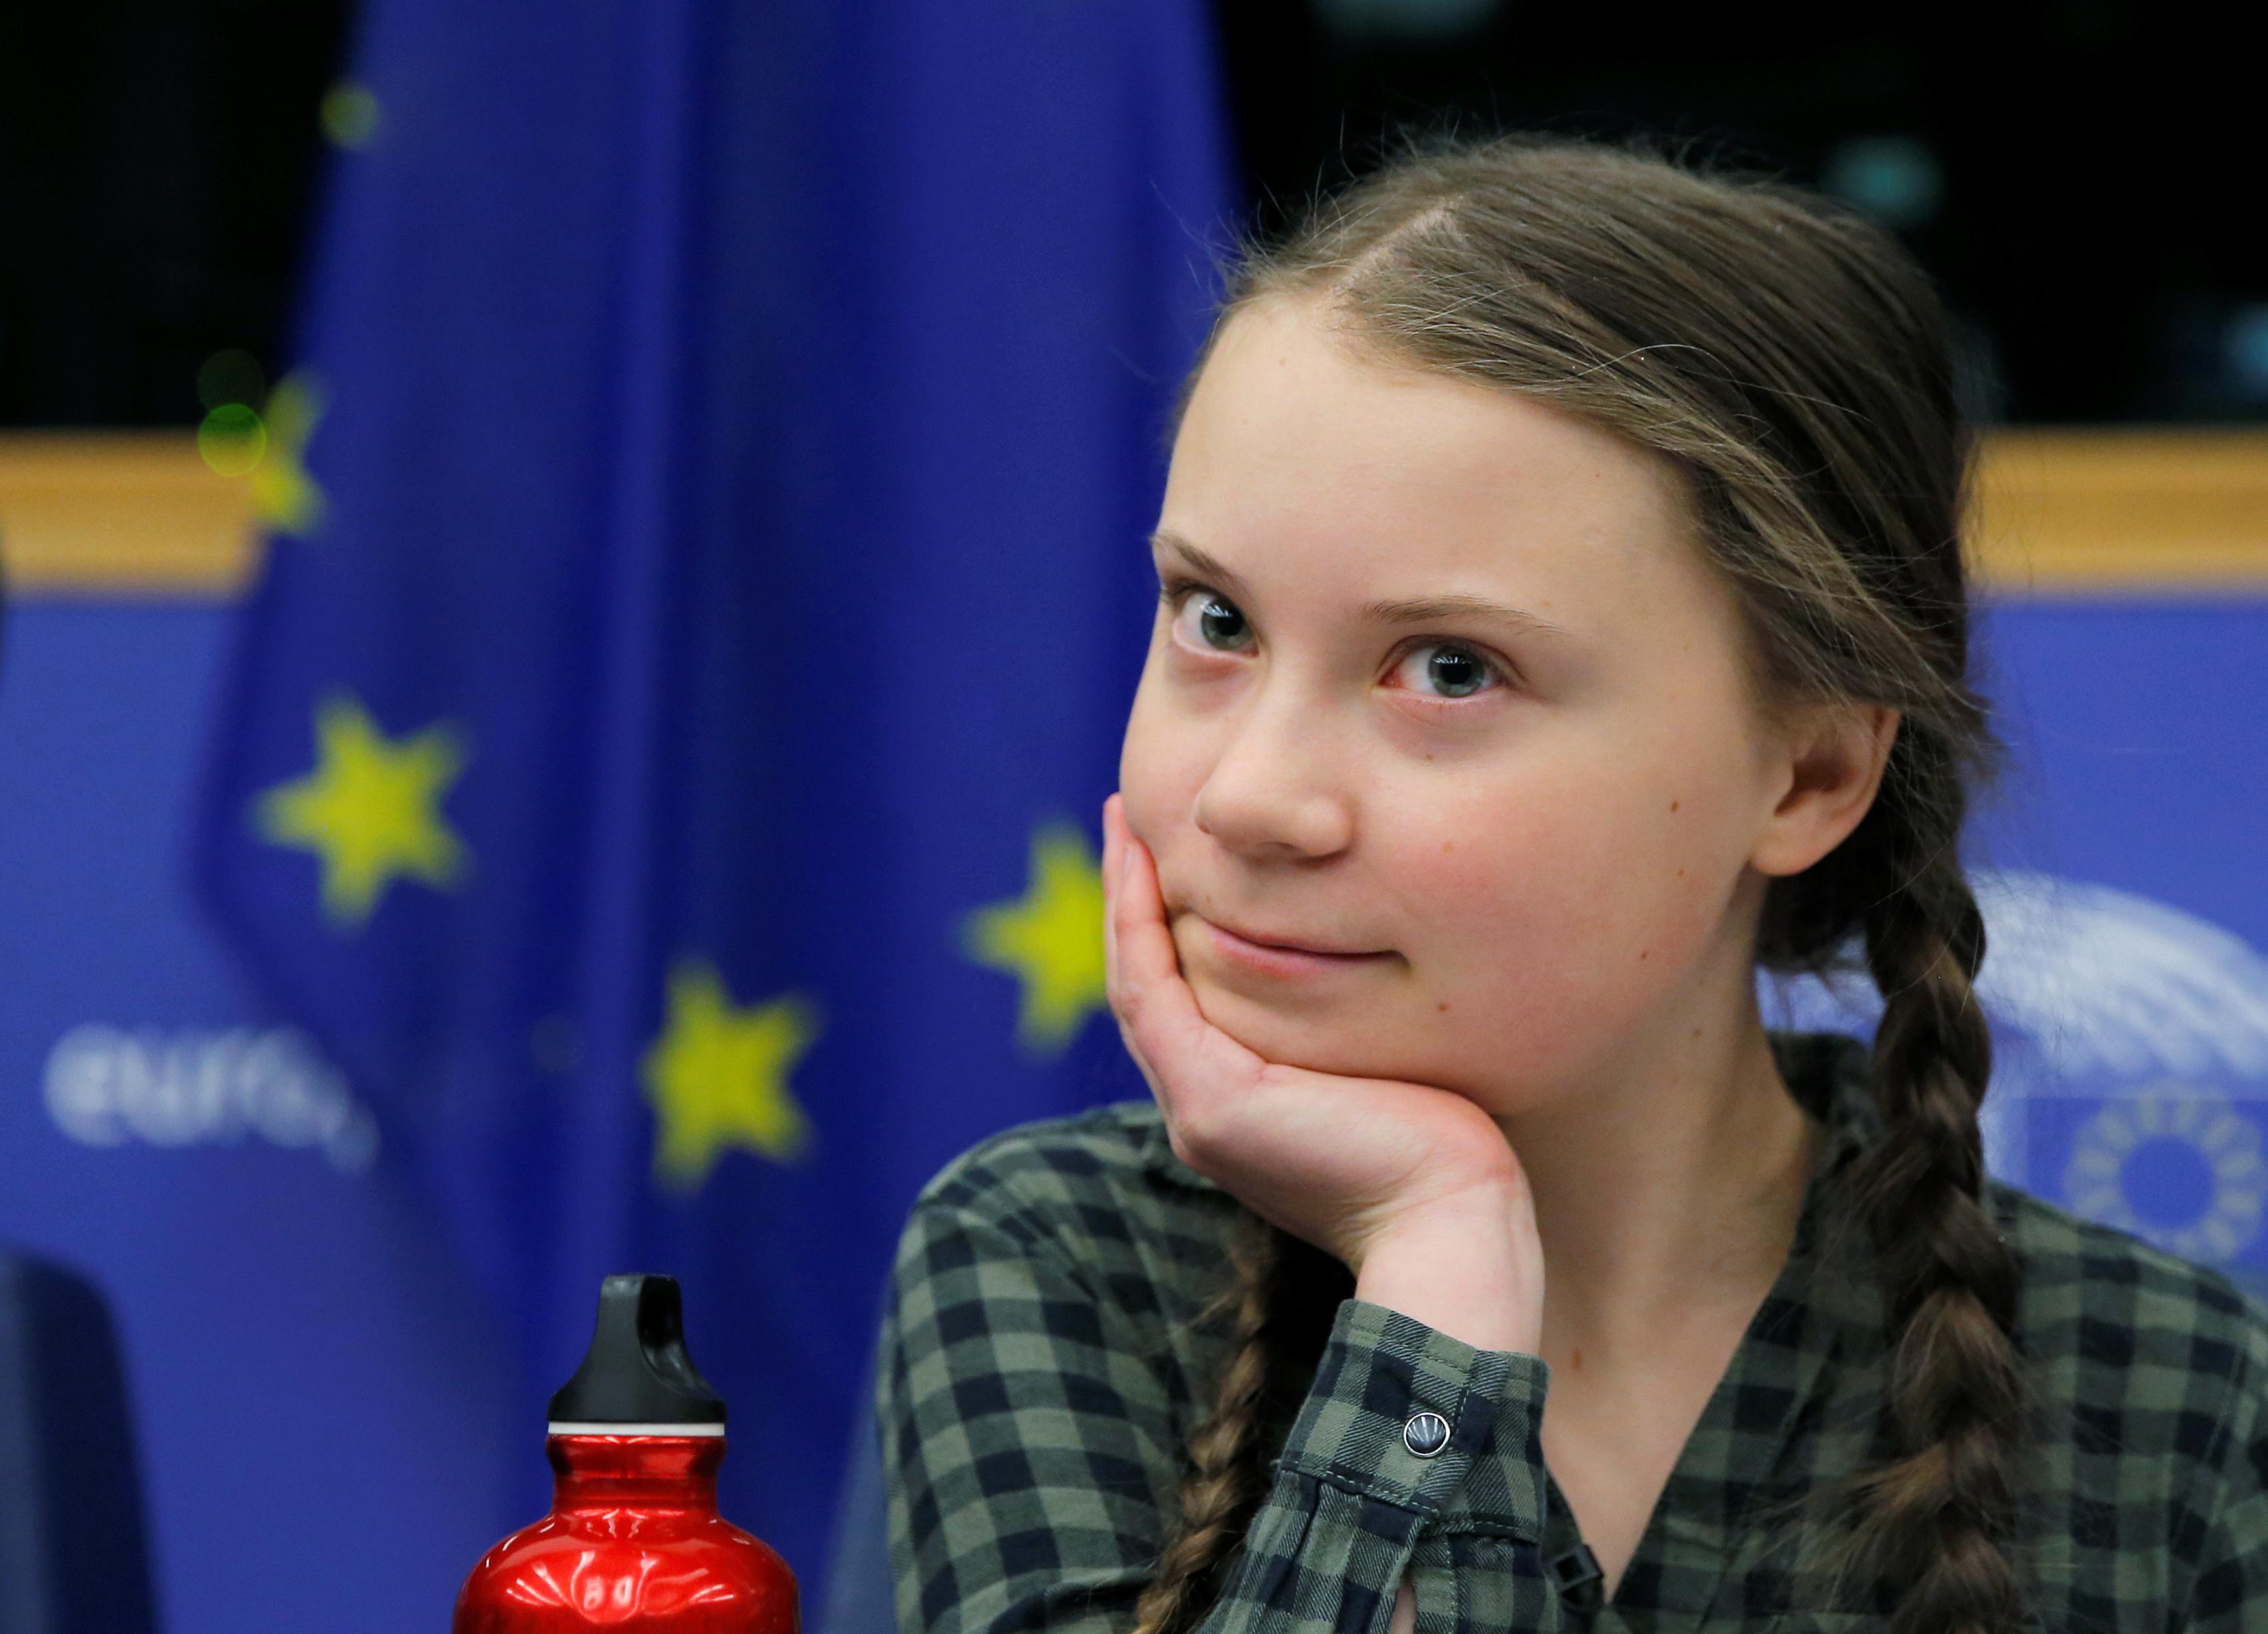 Teen climate activist warns EU its time to panic